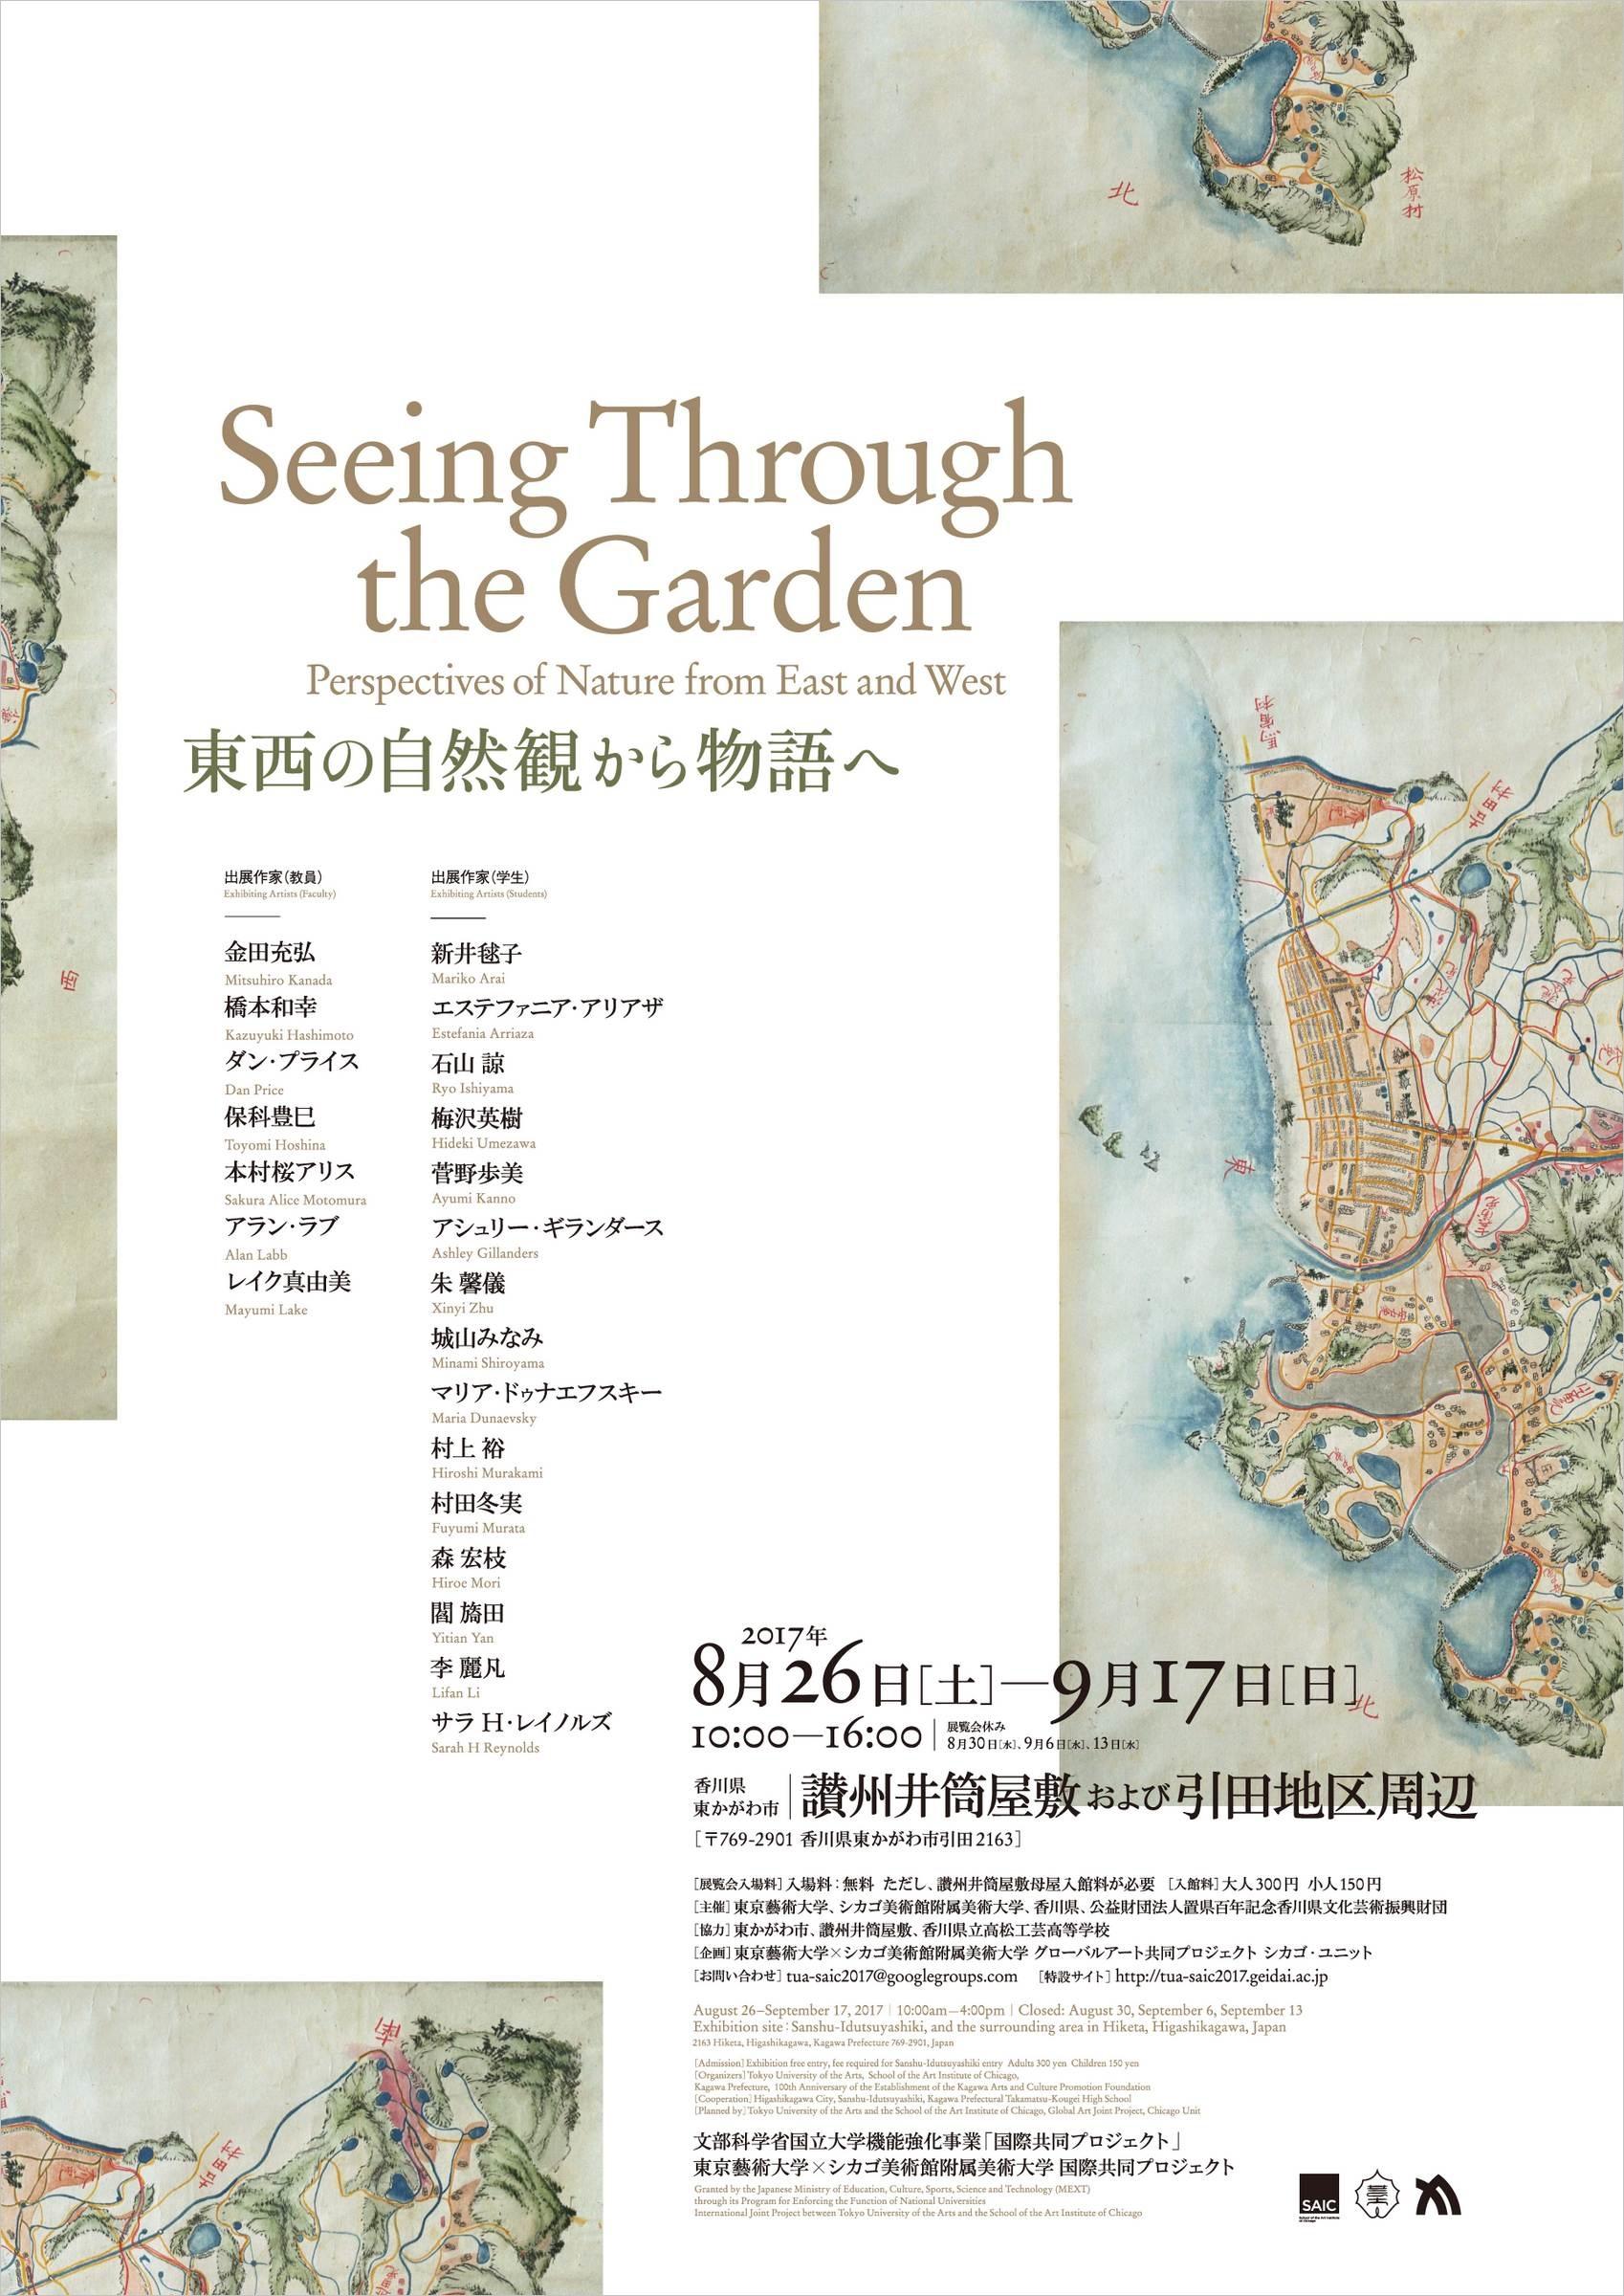 Seeing Through the Garden 東西の自然観から物語へ